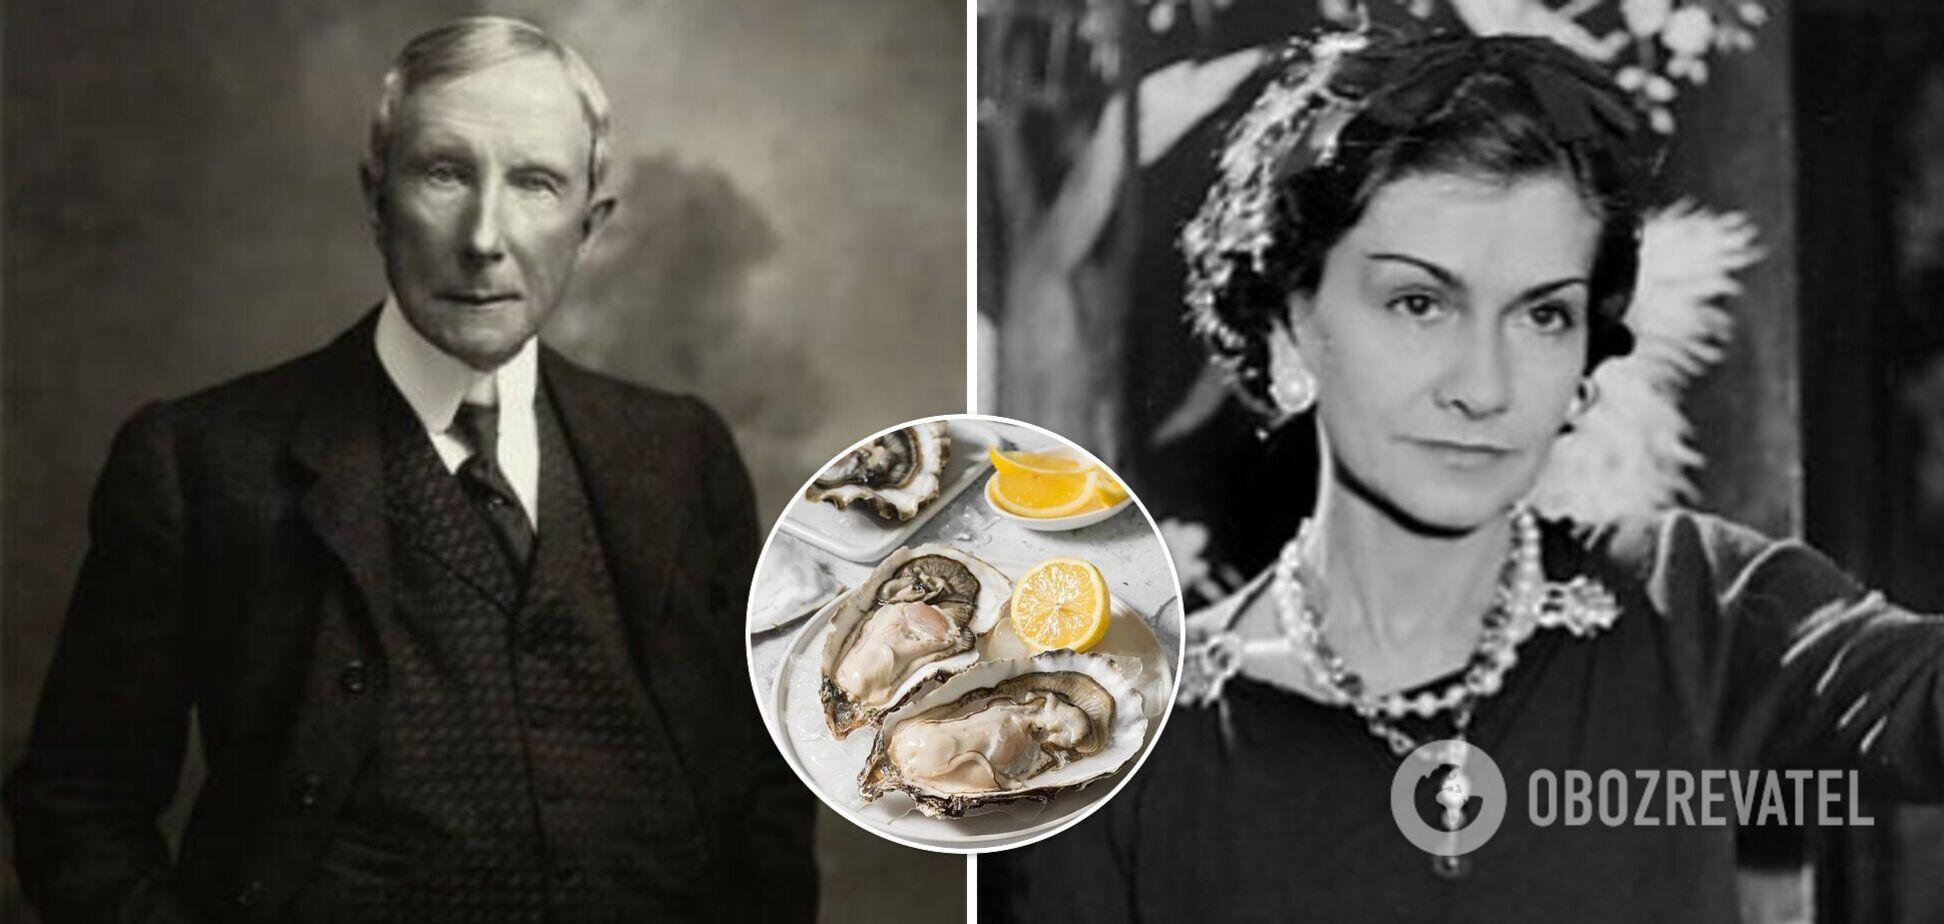 Устриці Джона Рокфеллера та салат Коко Шанель: страви з гучними назвами